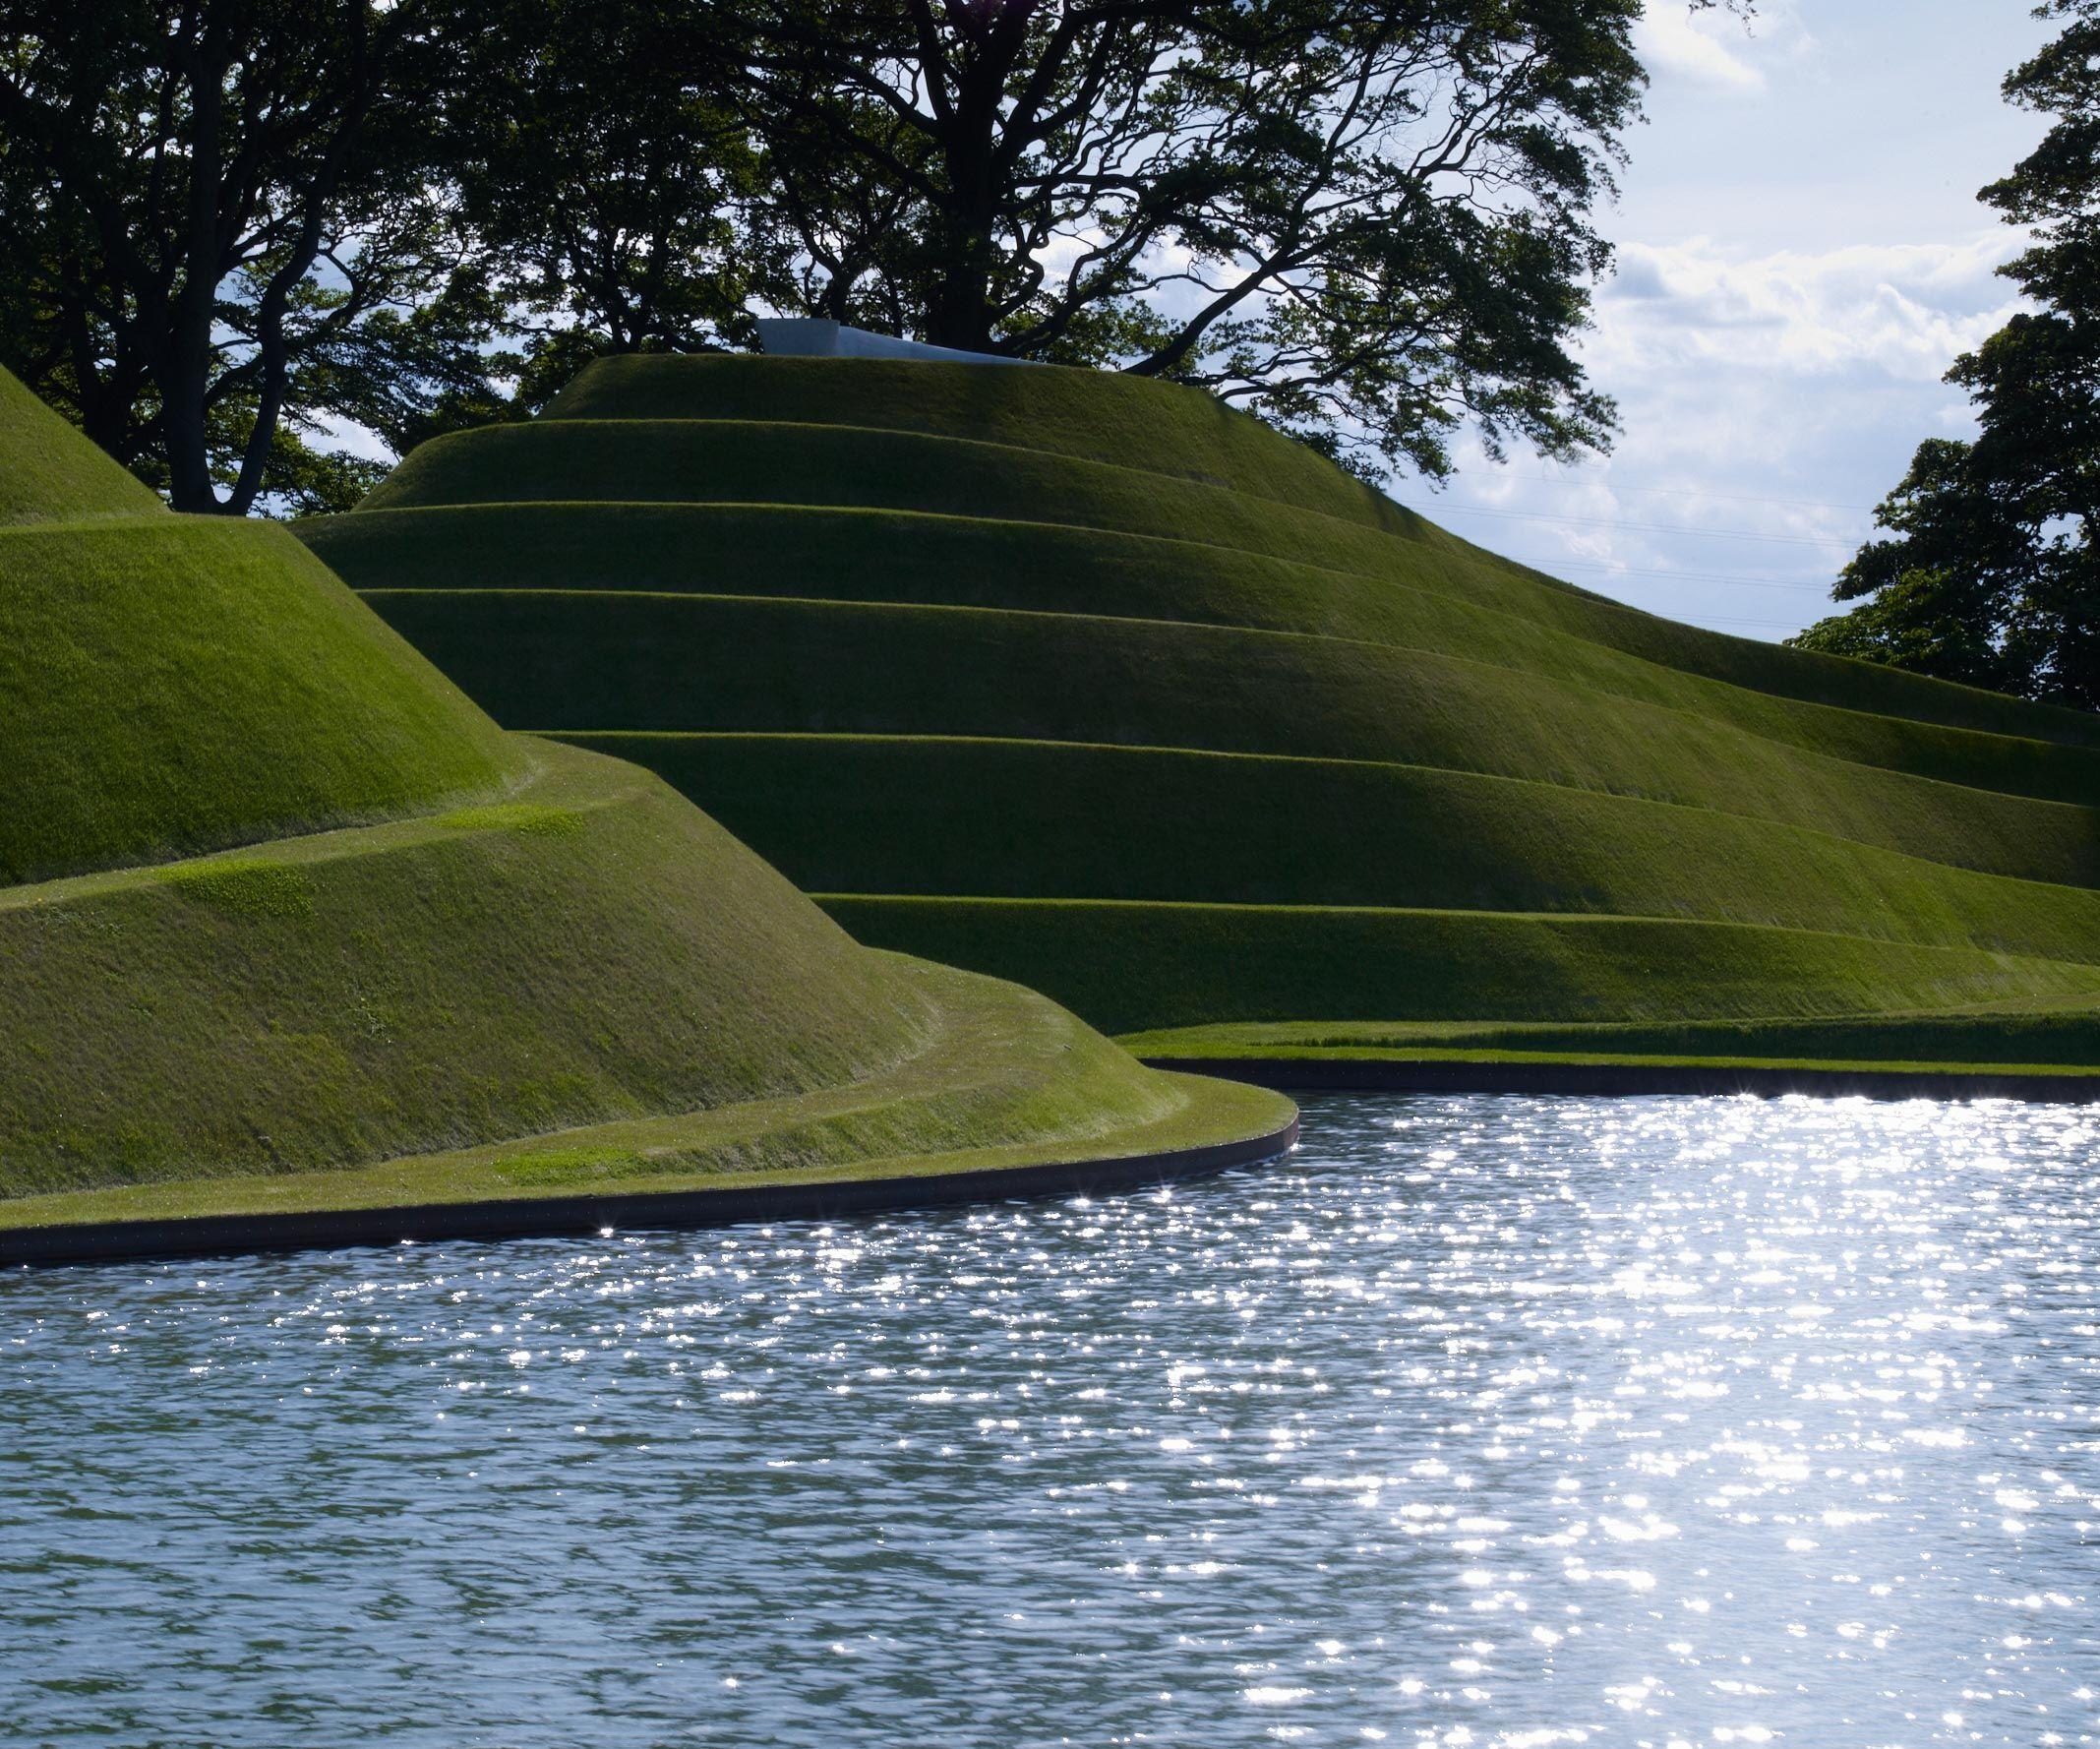 Charles Jenks - Cells of life, Jupiter Artland, Kirknewton, Edinburgh, Scotland (2003-2010)